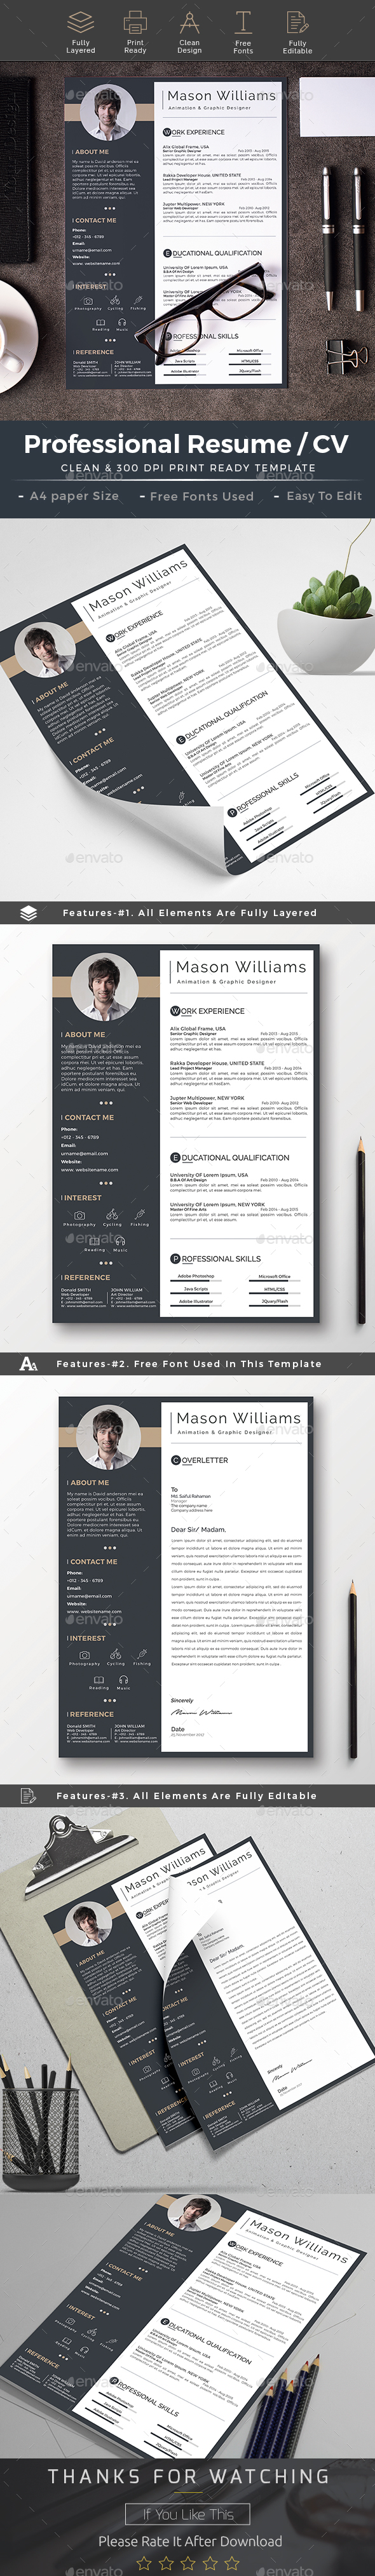 Resume cv word Resume template free, Job resume template